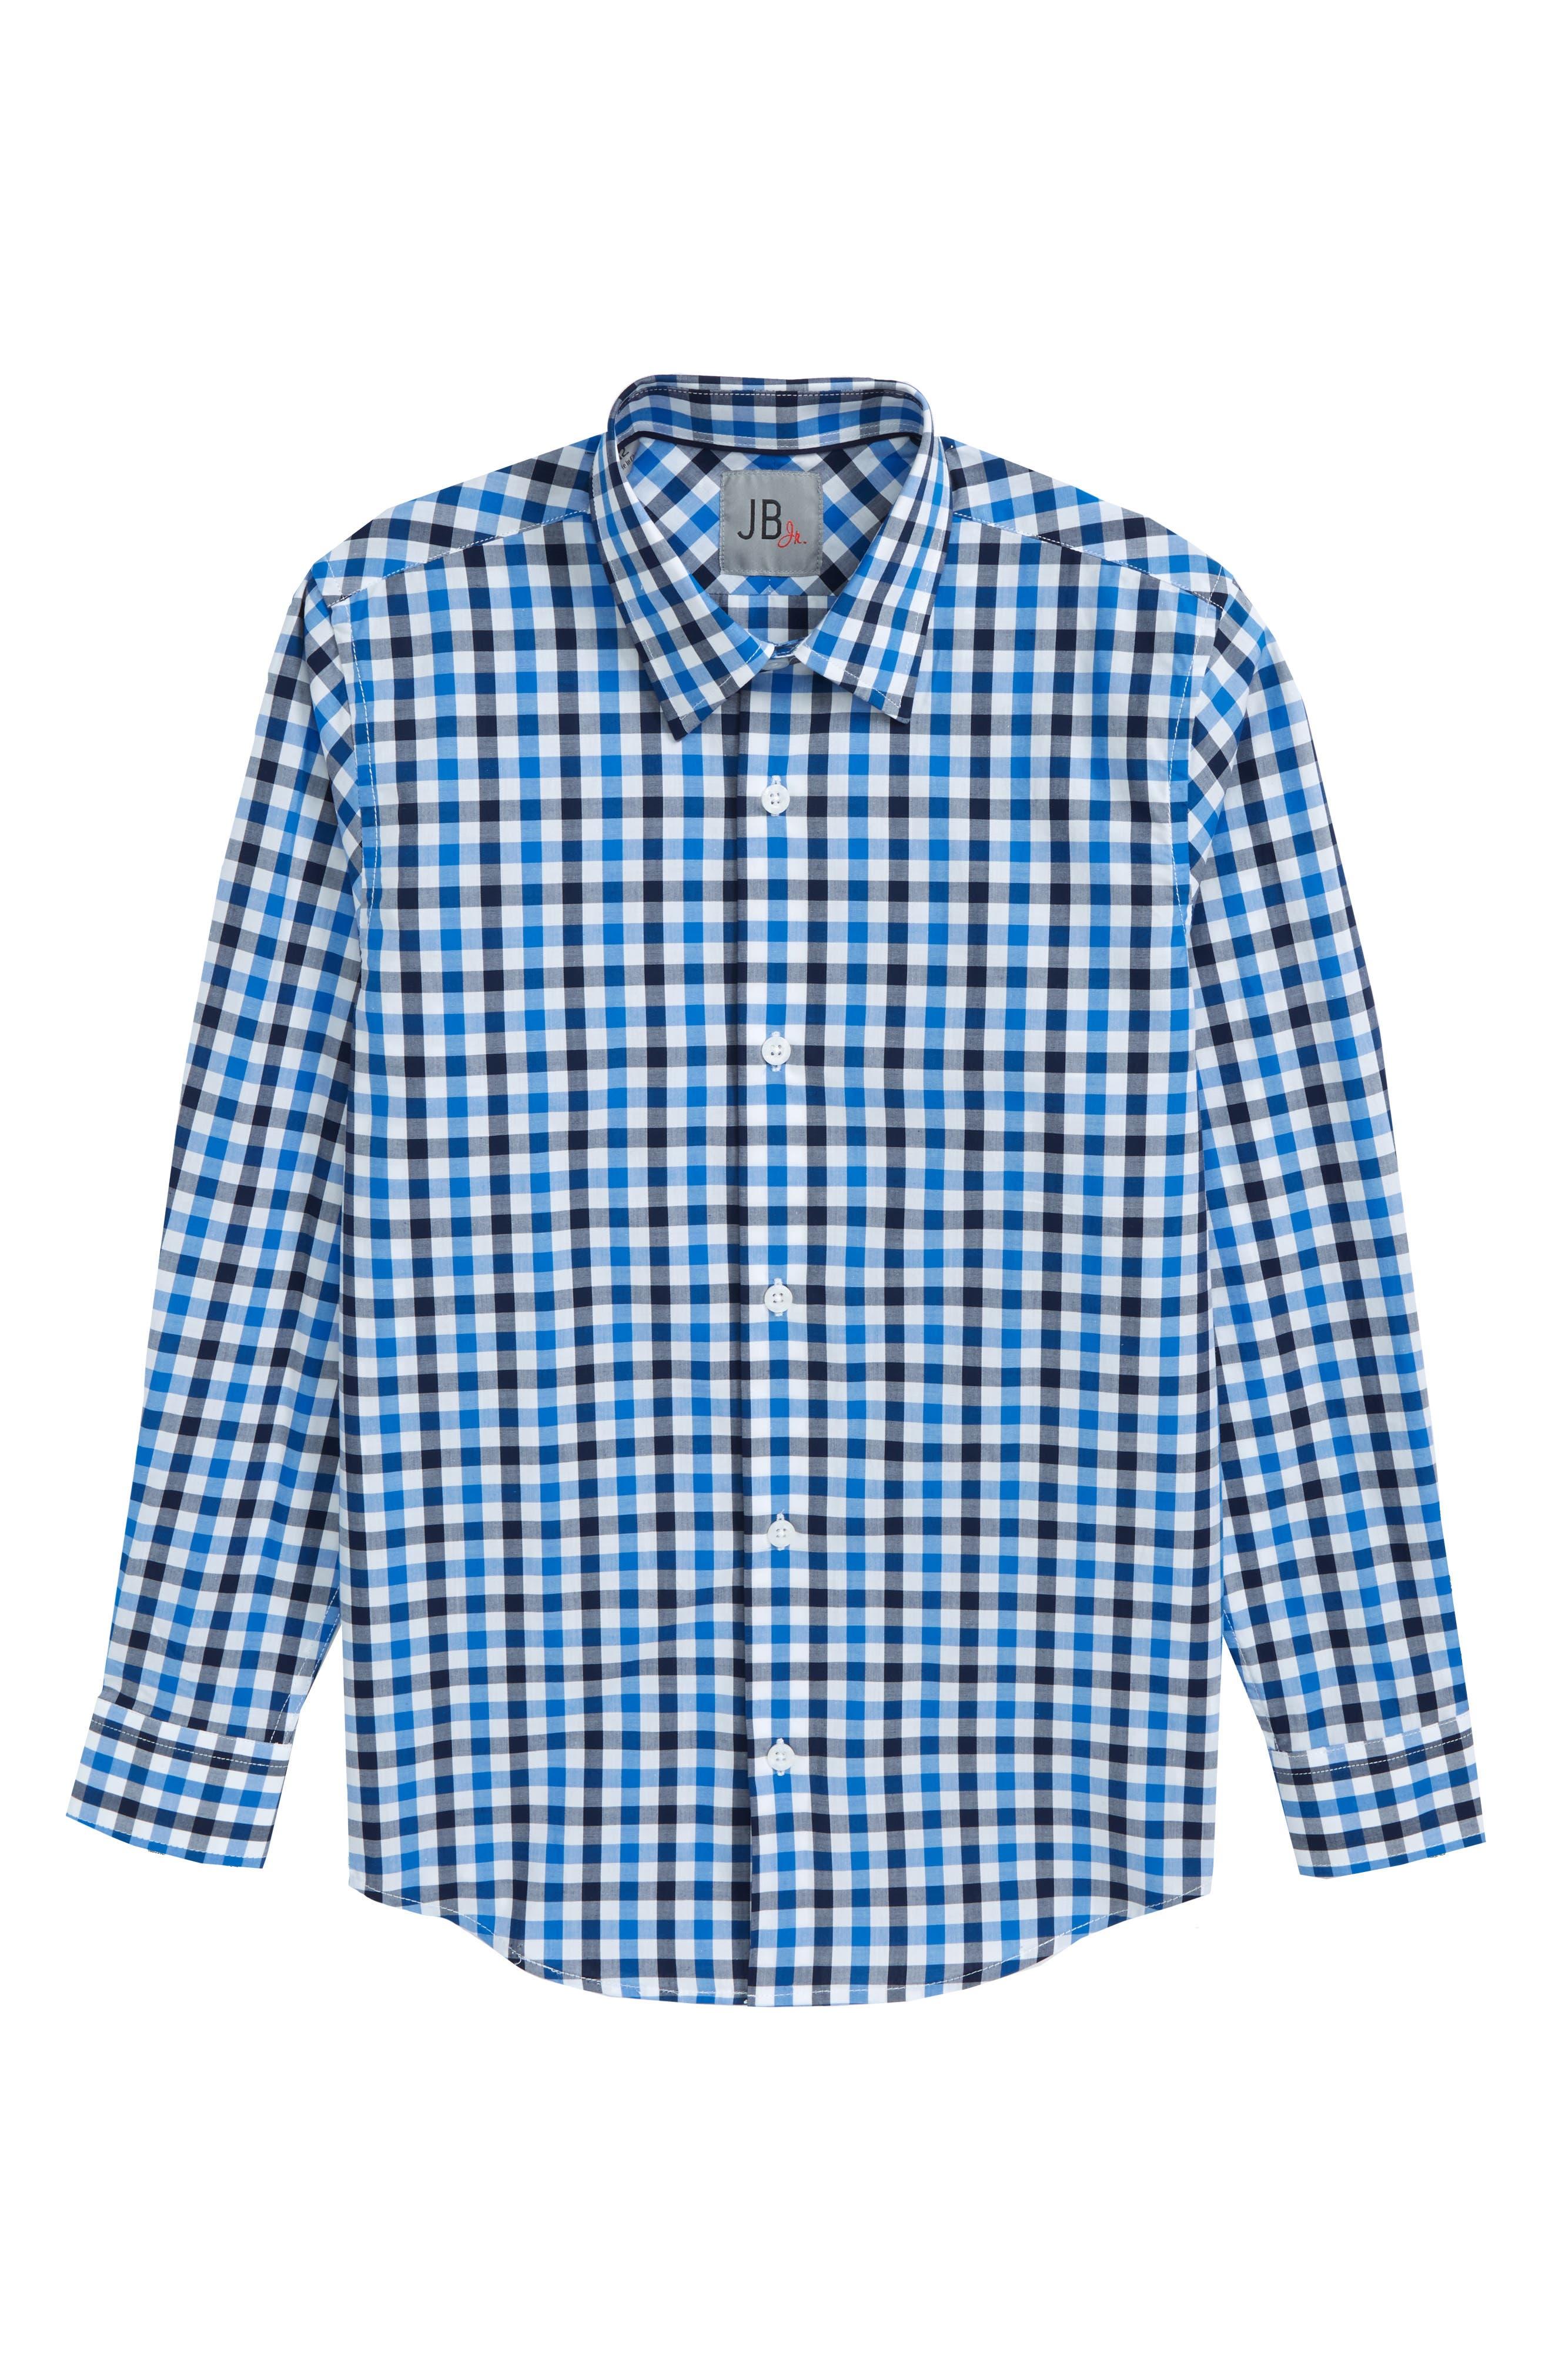 JB JR Check Dress Shirt, Main, color, 422